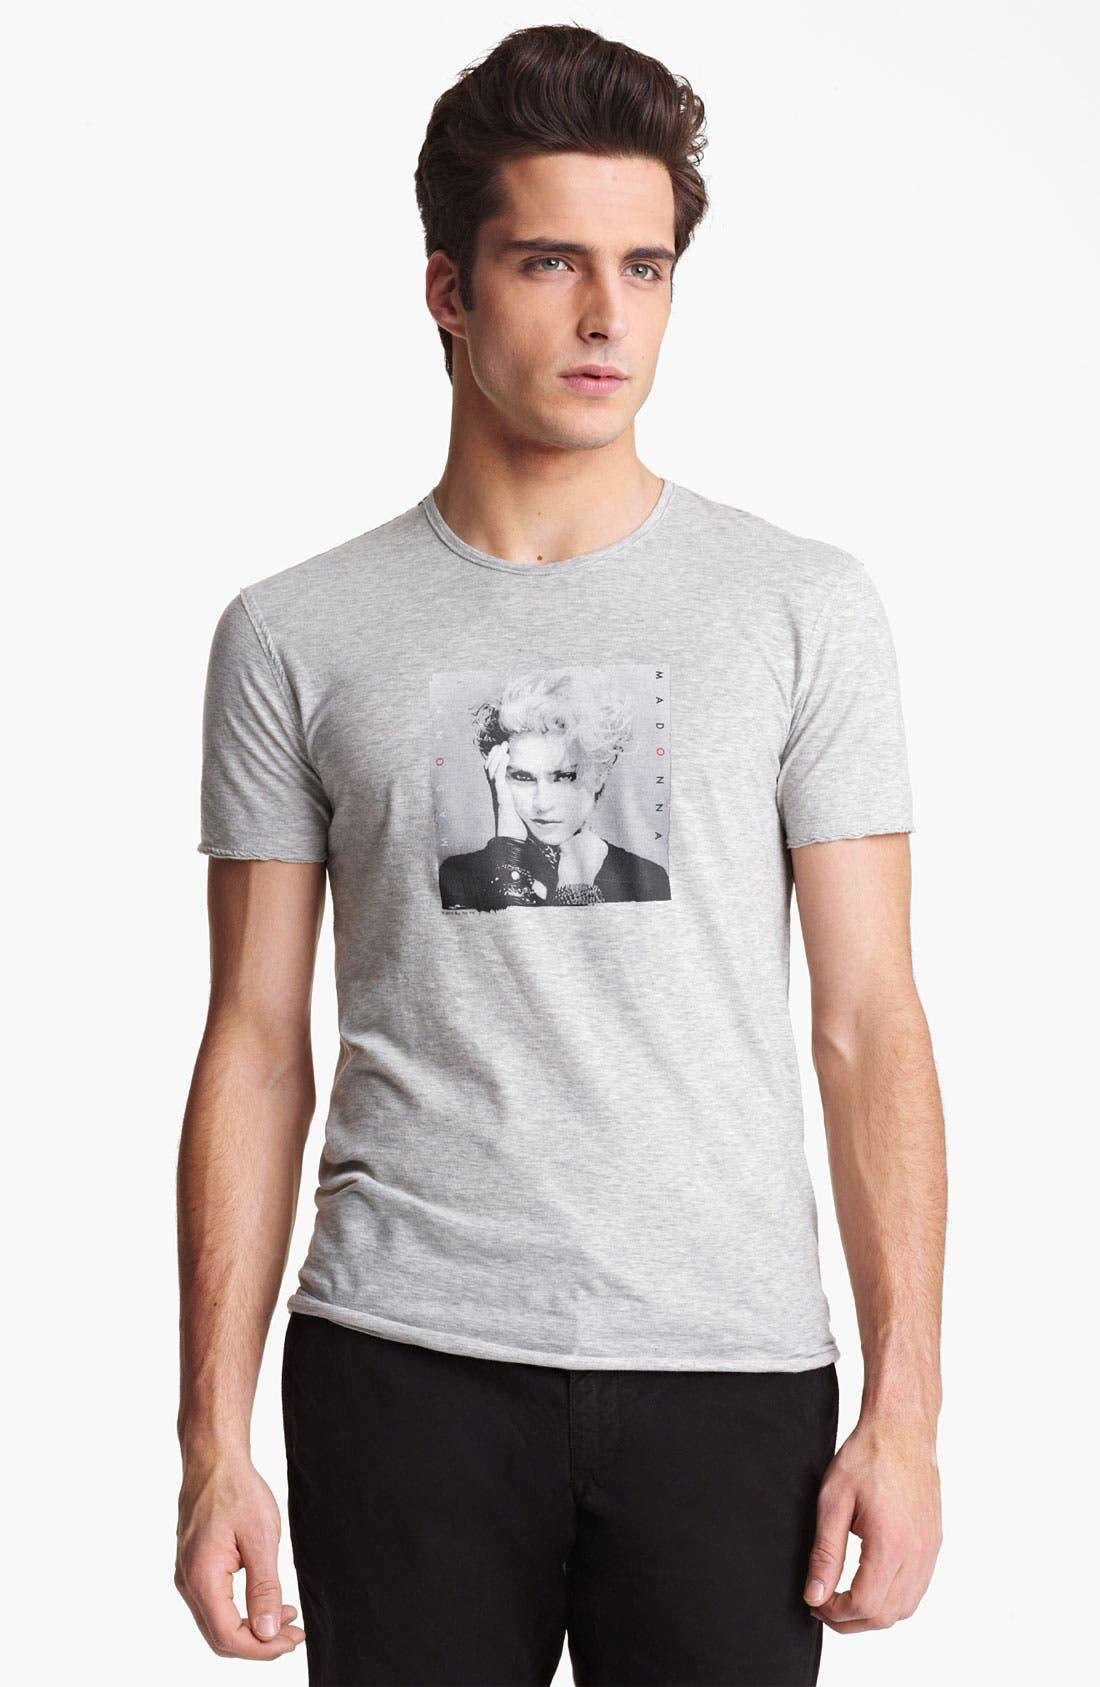 Alternate Image 1 Selected - Dolce&Gabbana 'Madonna' Graphic T-Shirt